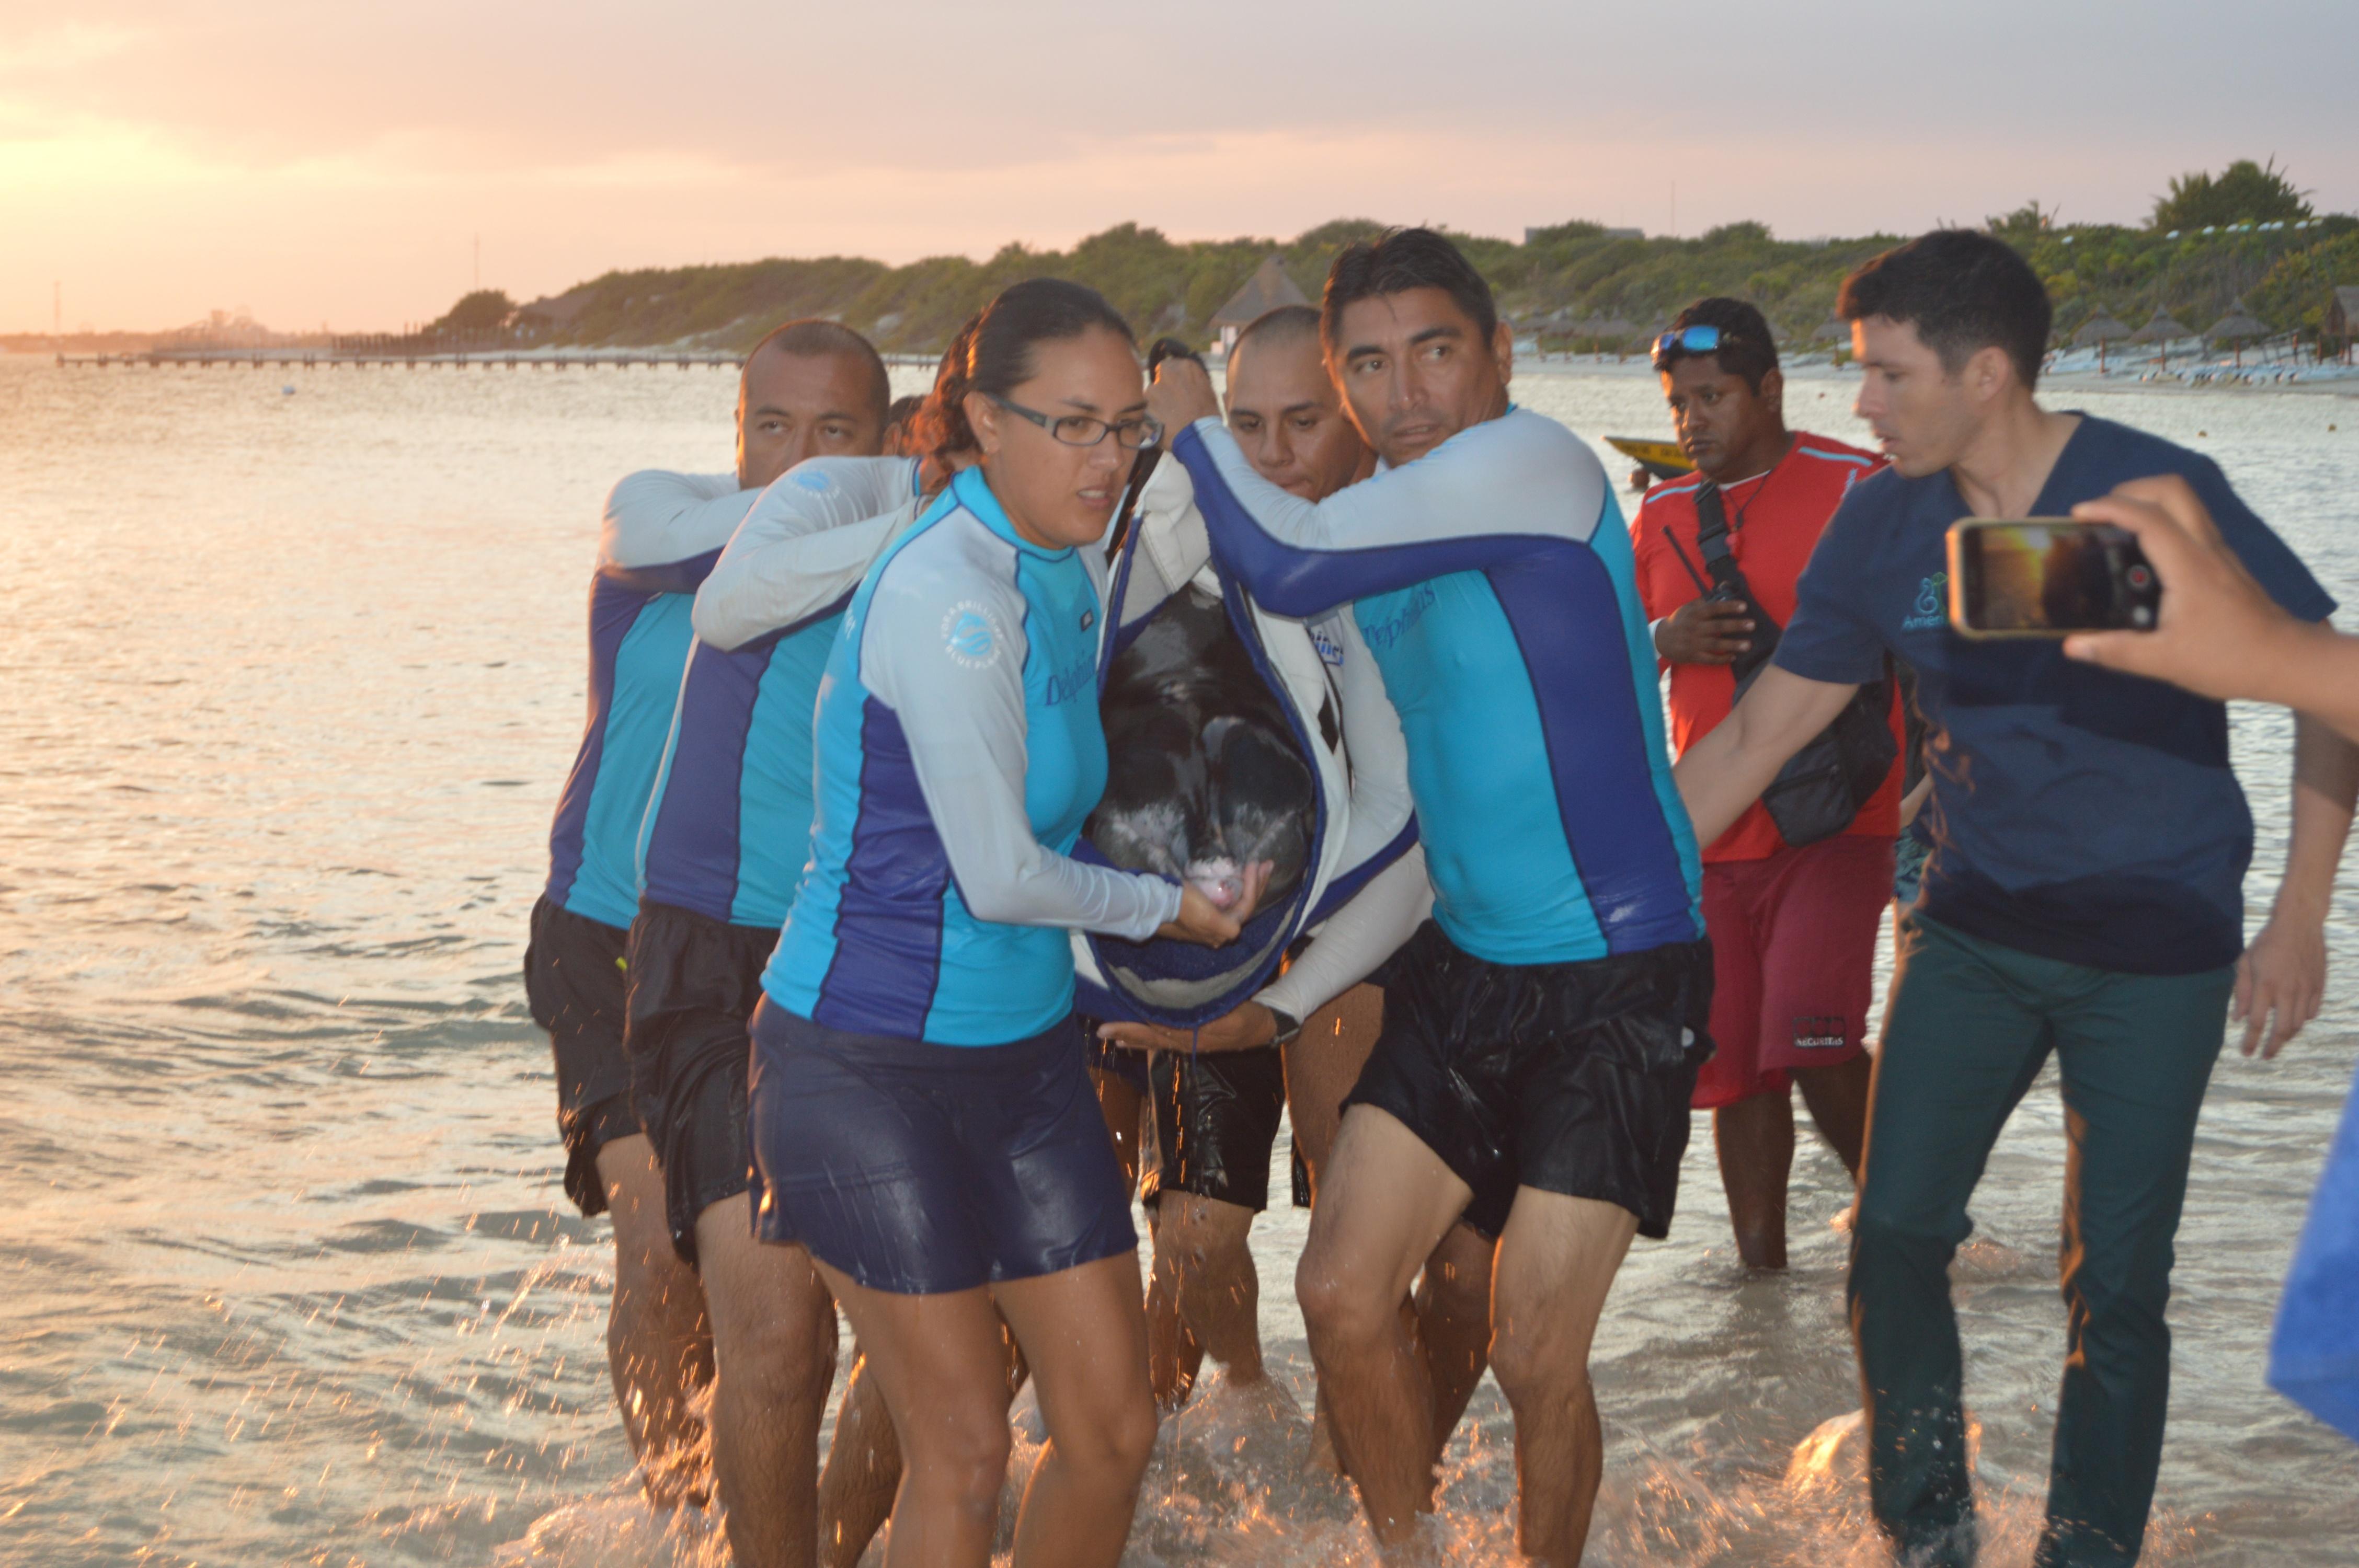 dolphins-and-pollution-delphinus-welfare-program .jpg